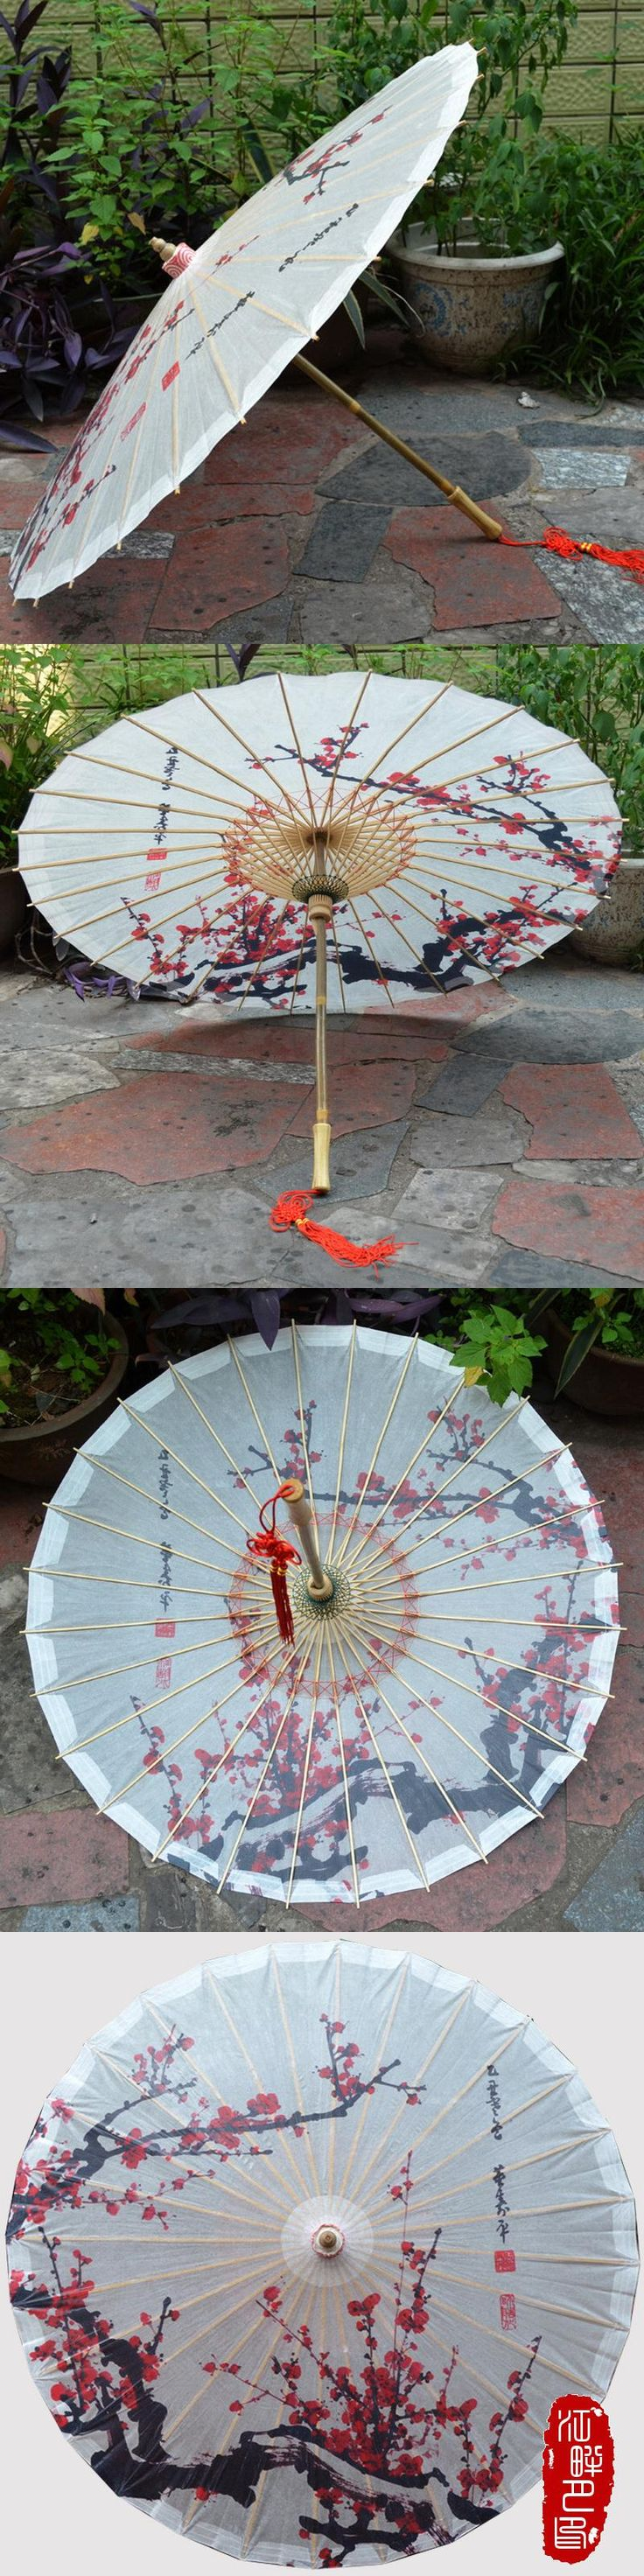 Red Plum Blossom Chinese Handmade Oil Paper Umbrella Sunshade Parasol Decoration Gift Dance Umbrella